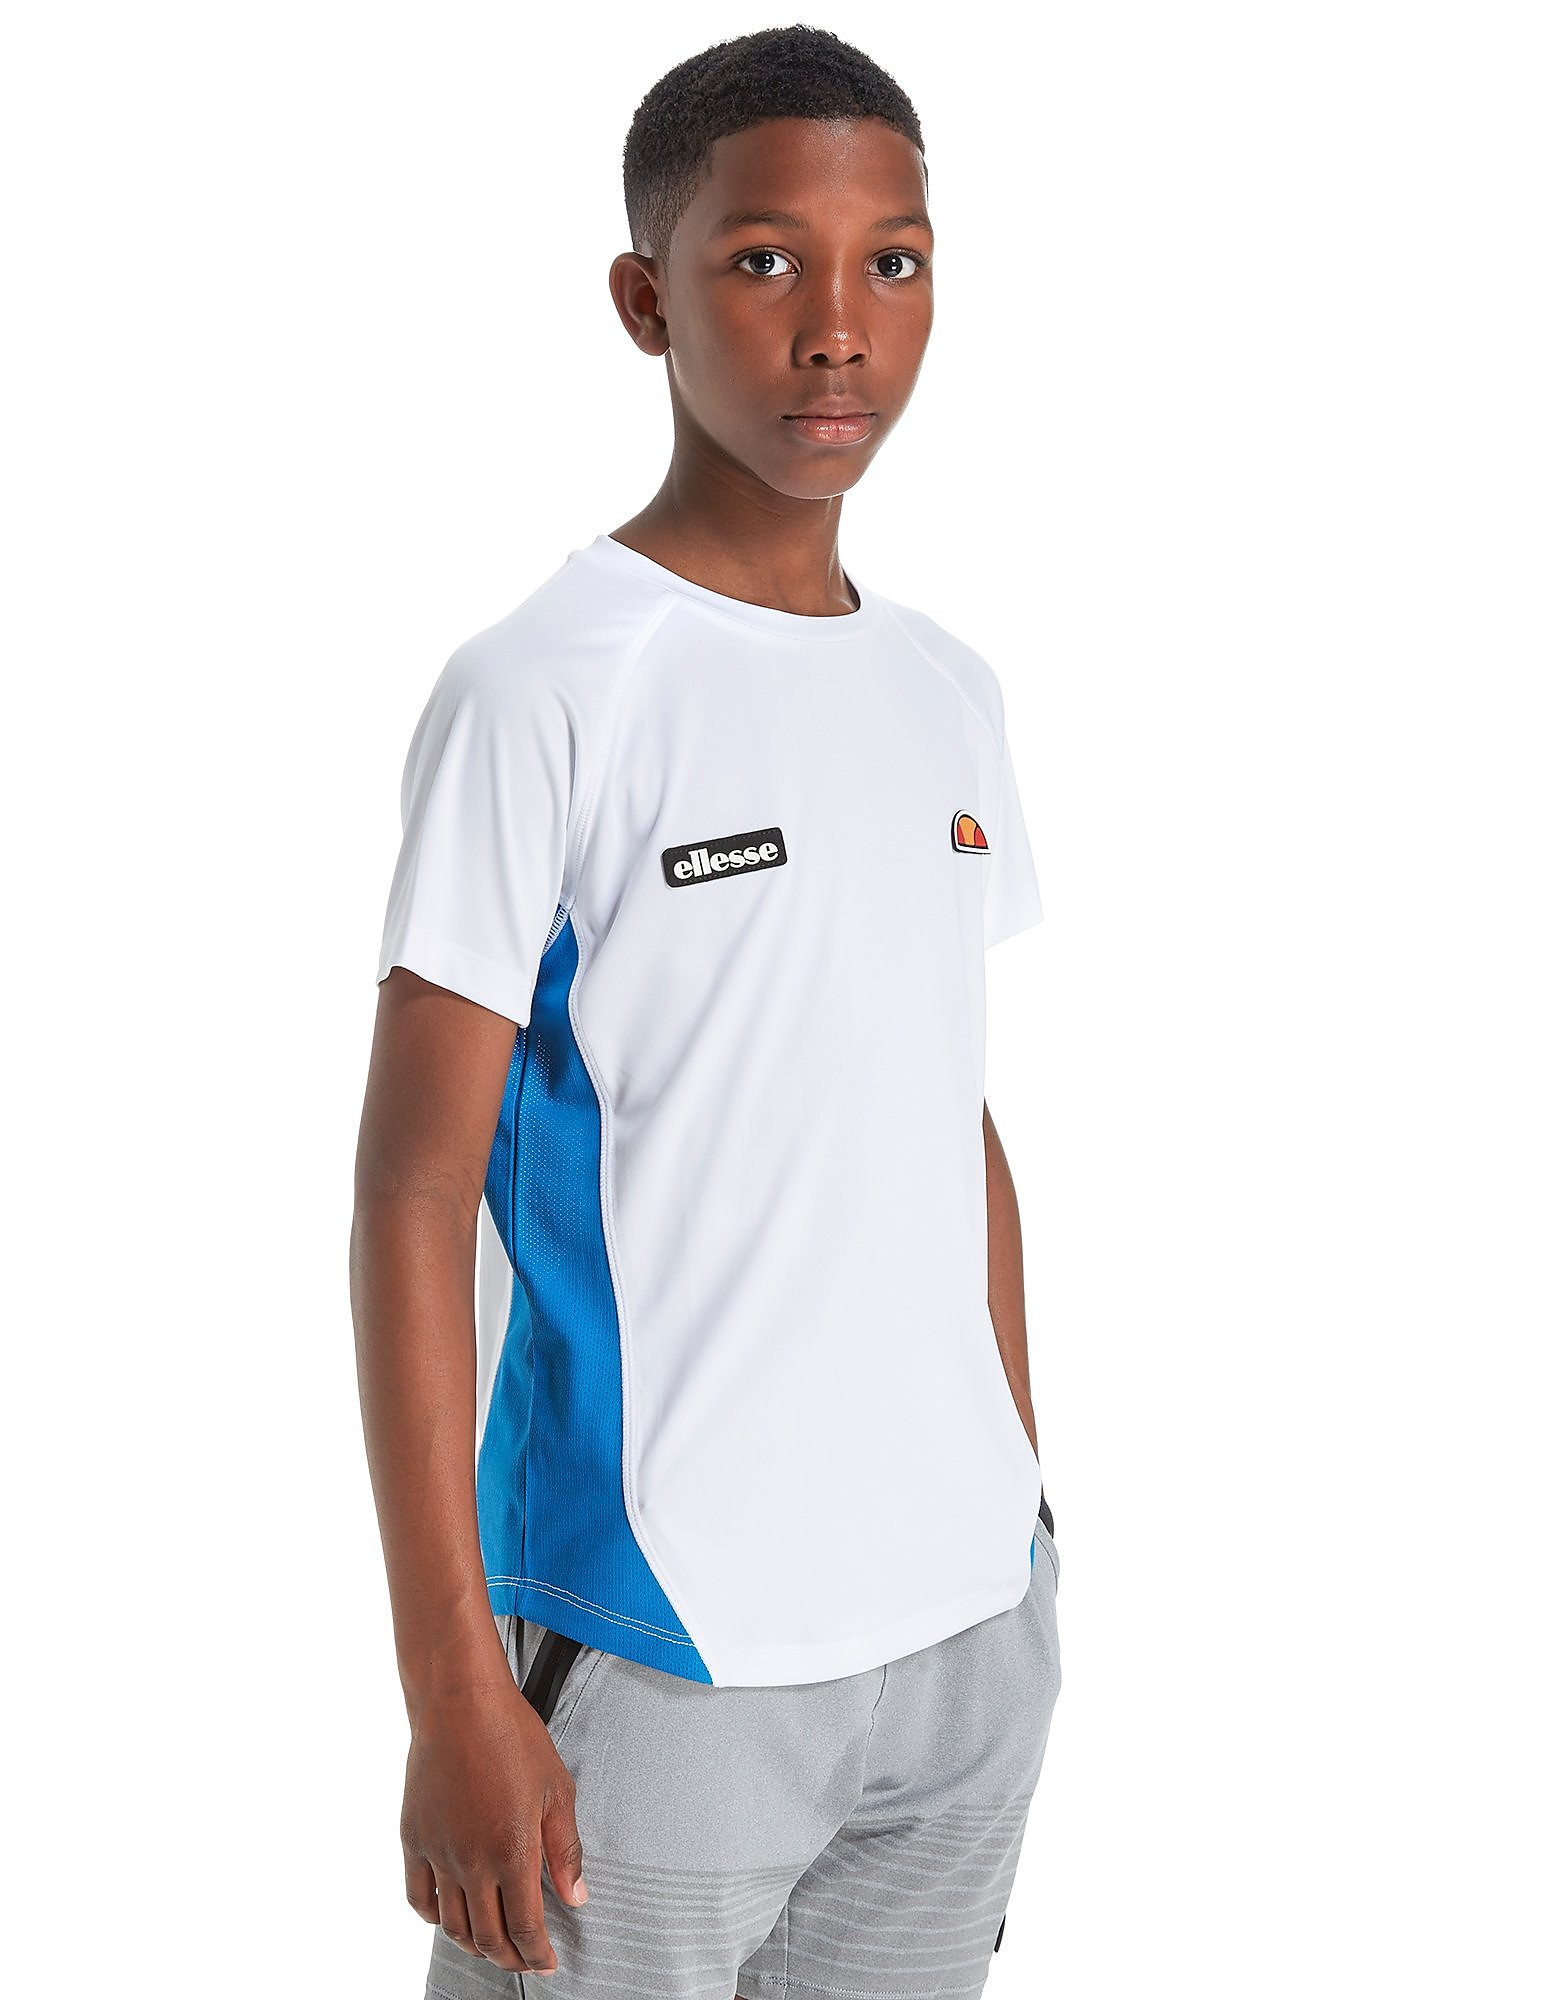 Ellesse T-shirt Veron Sport Junior